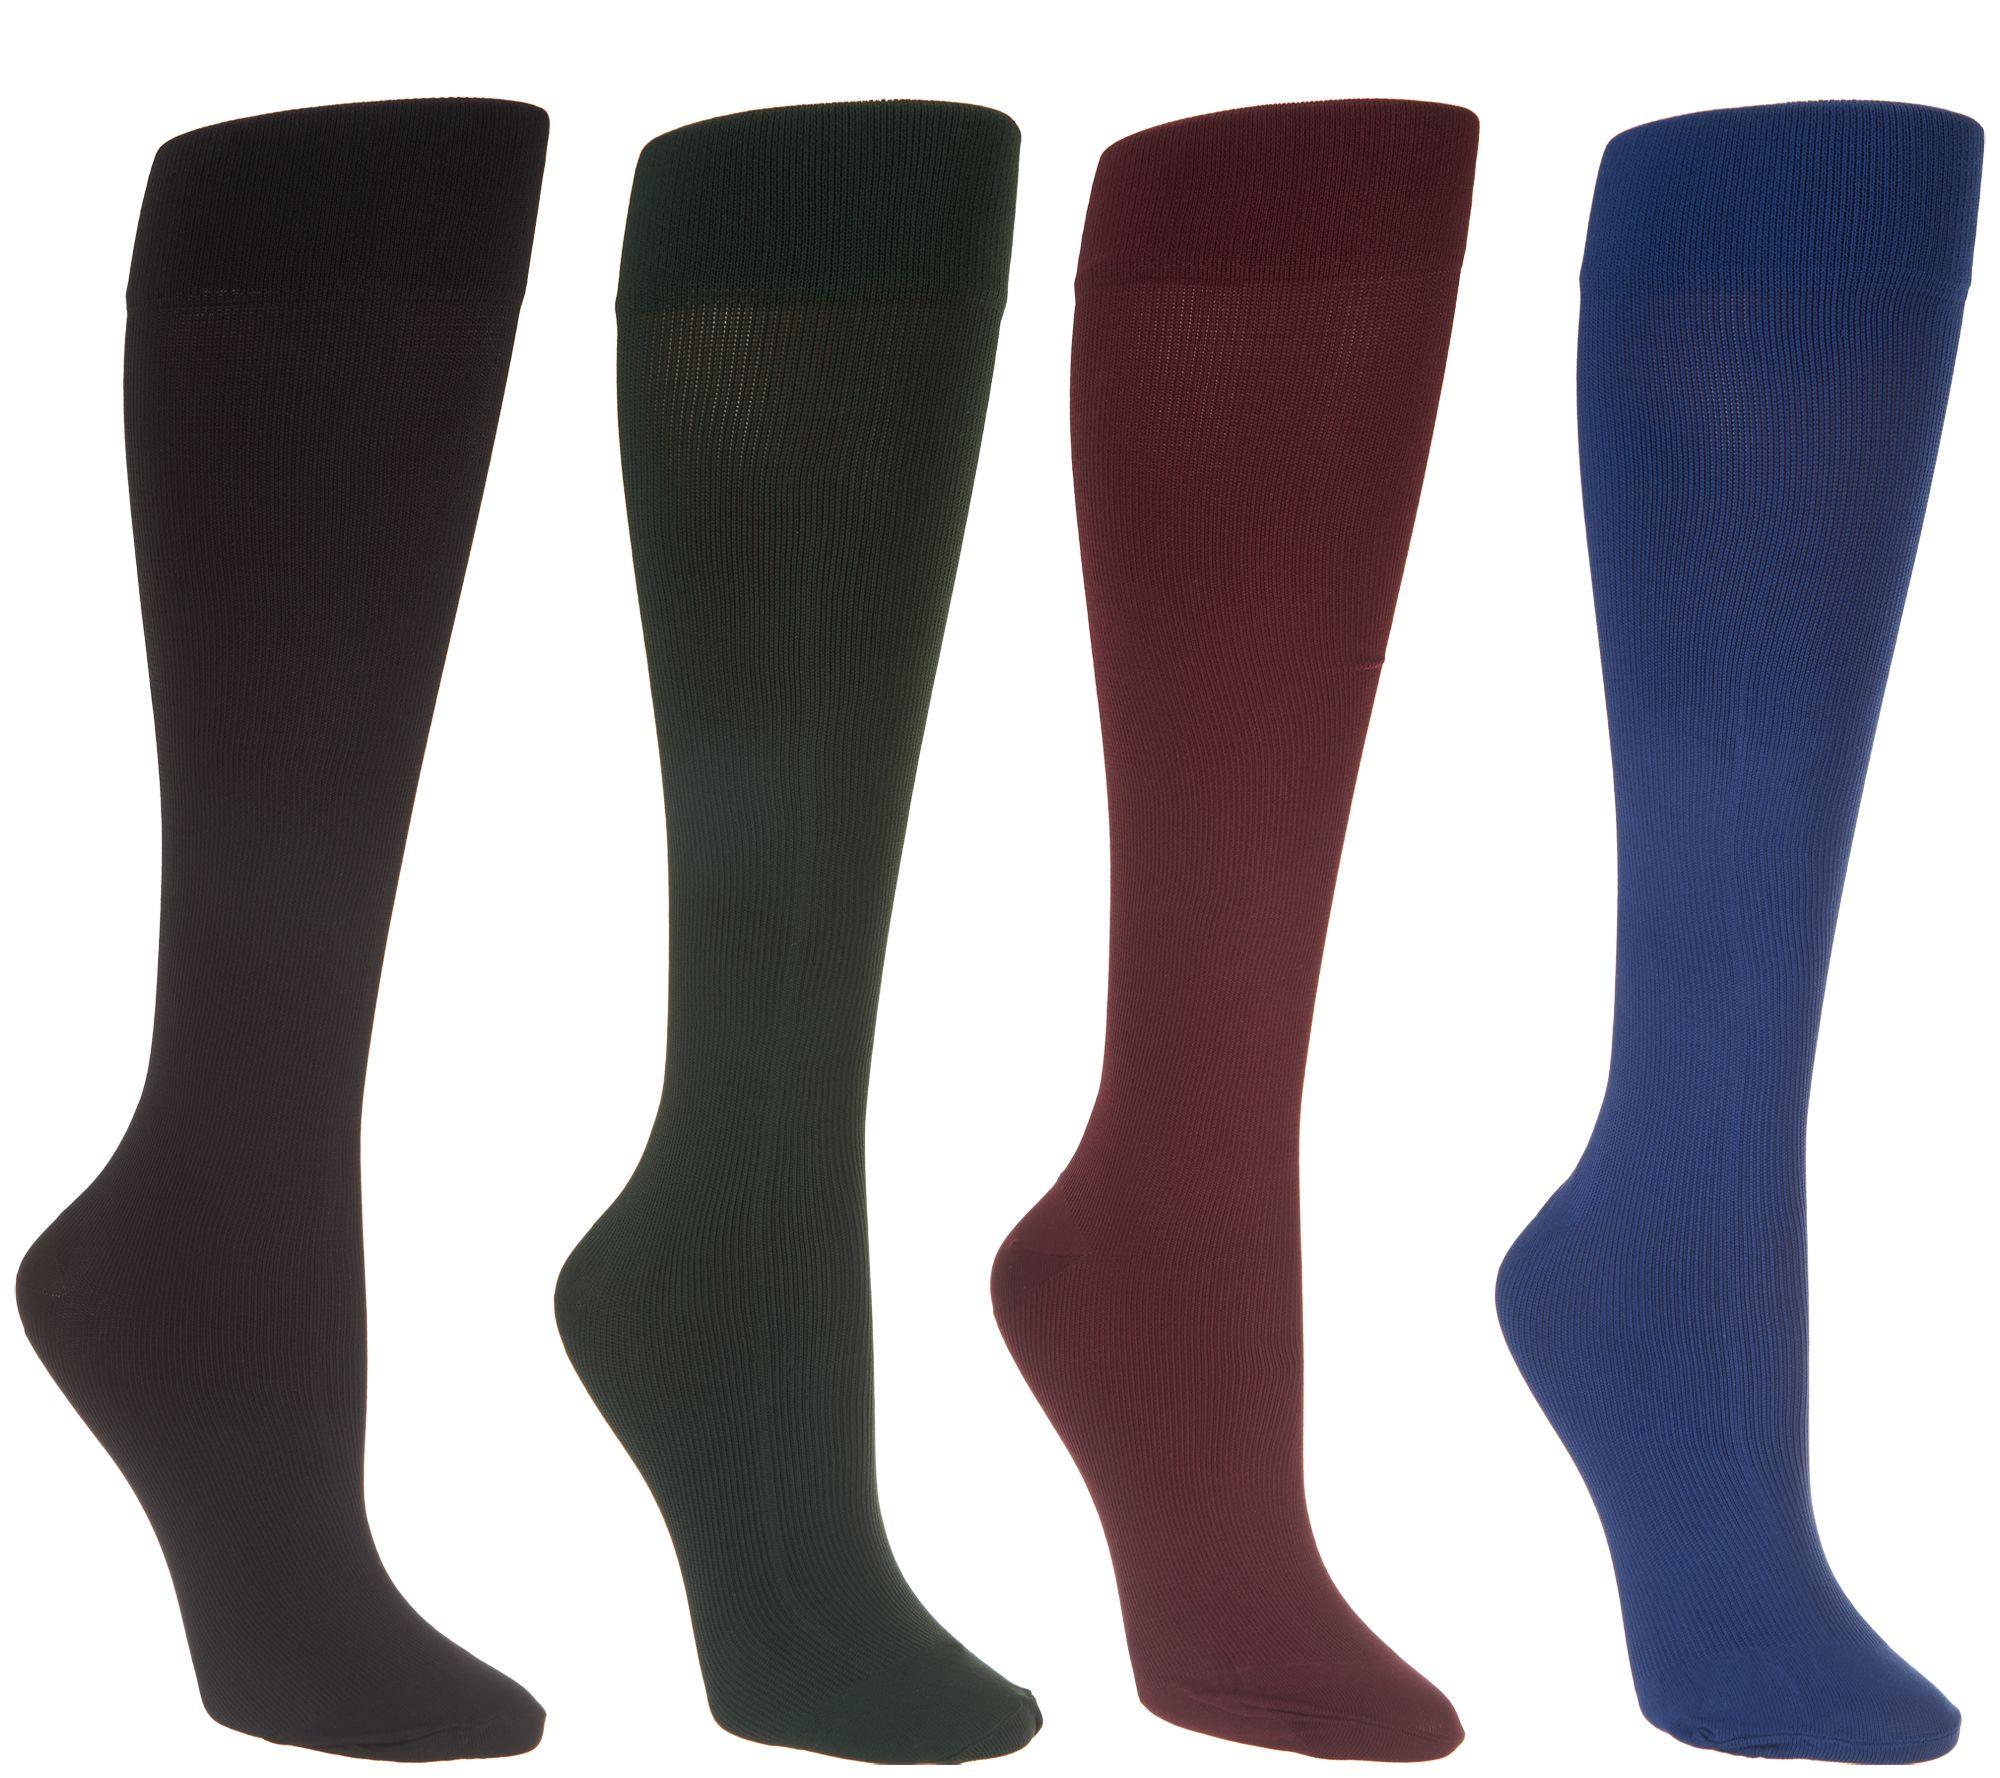 8a519804583 Legacy Graduated Compression Socks 4 Pack - Page 1 — QVC.com